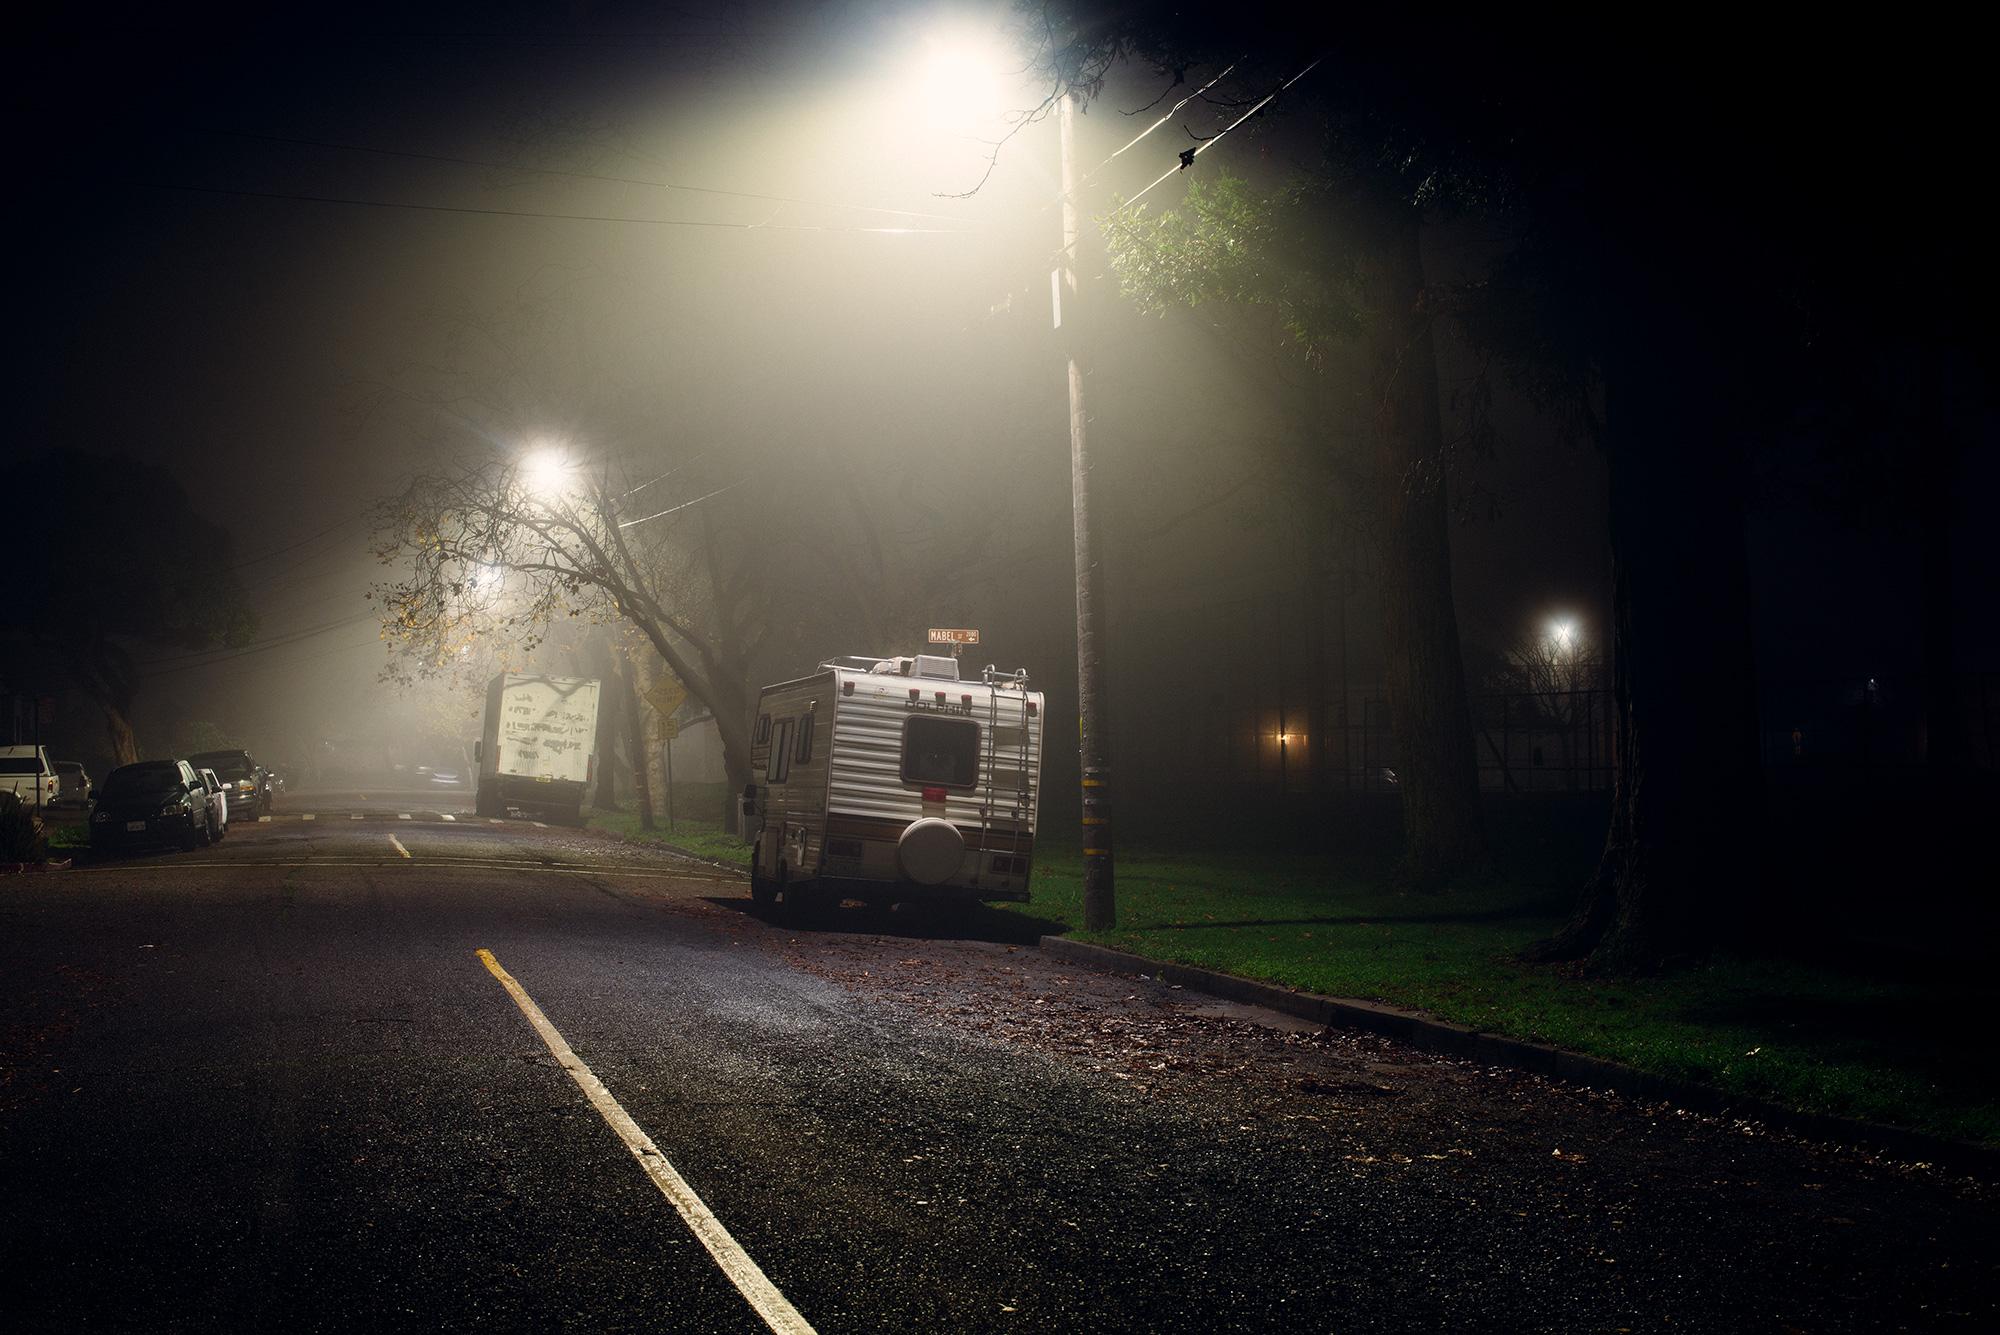 Van on street at night with street lights.